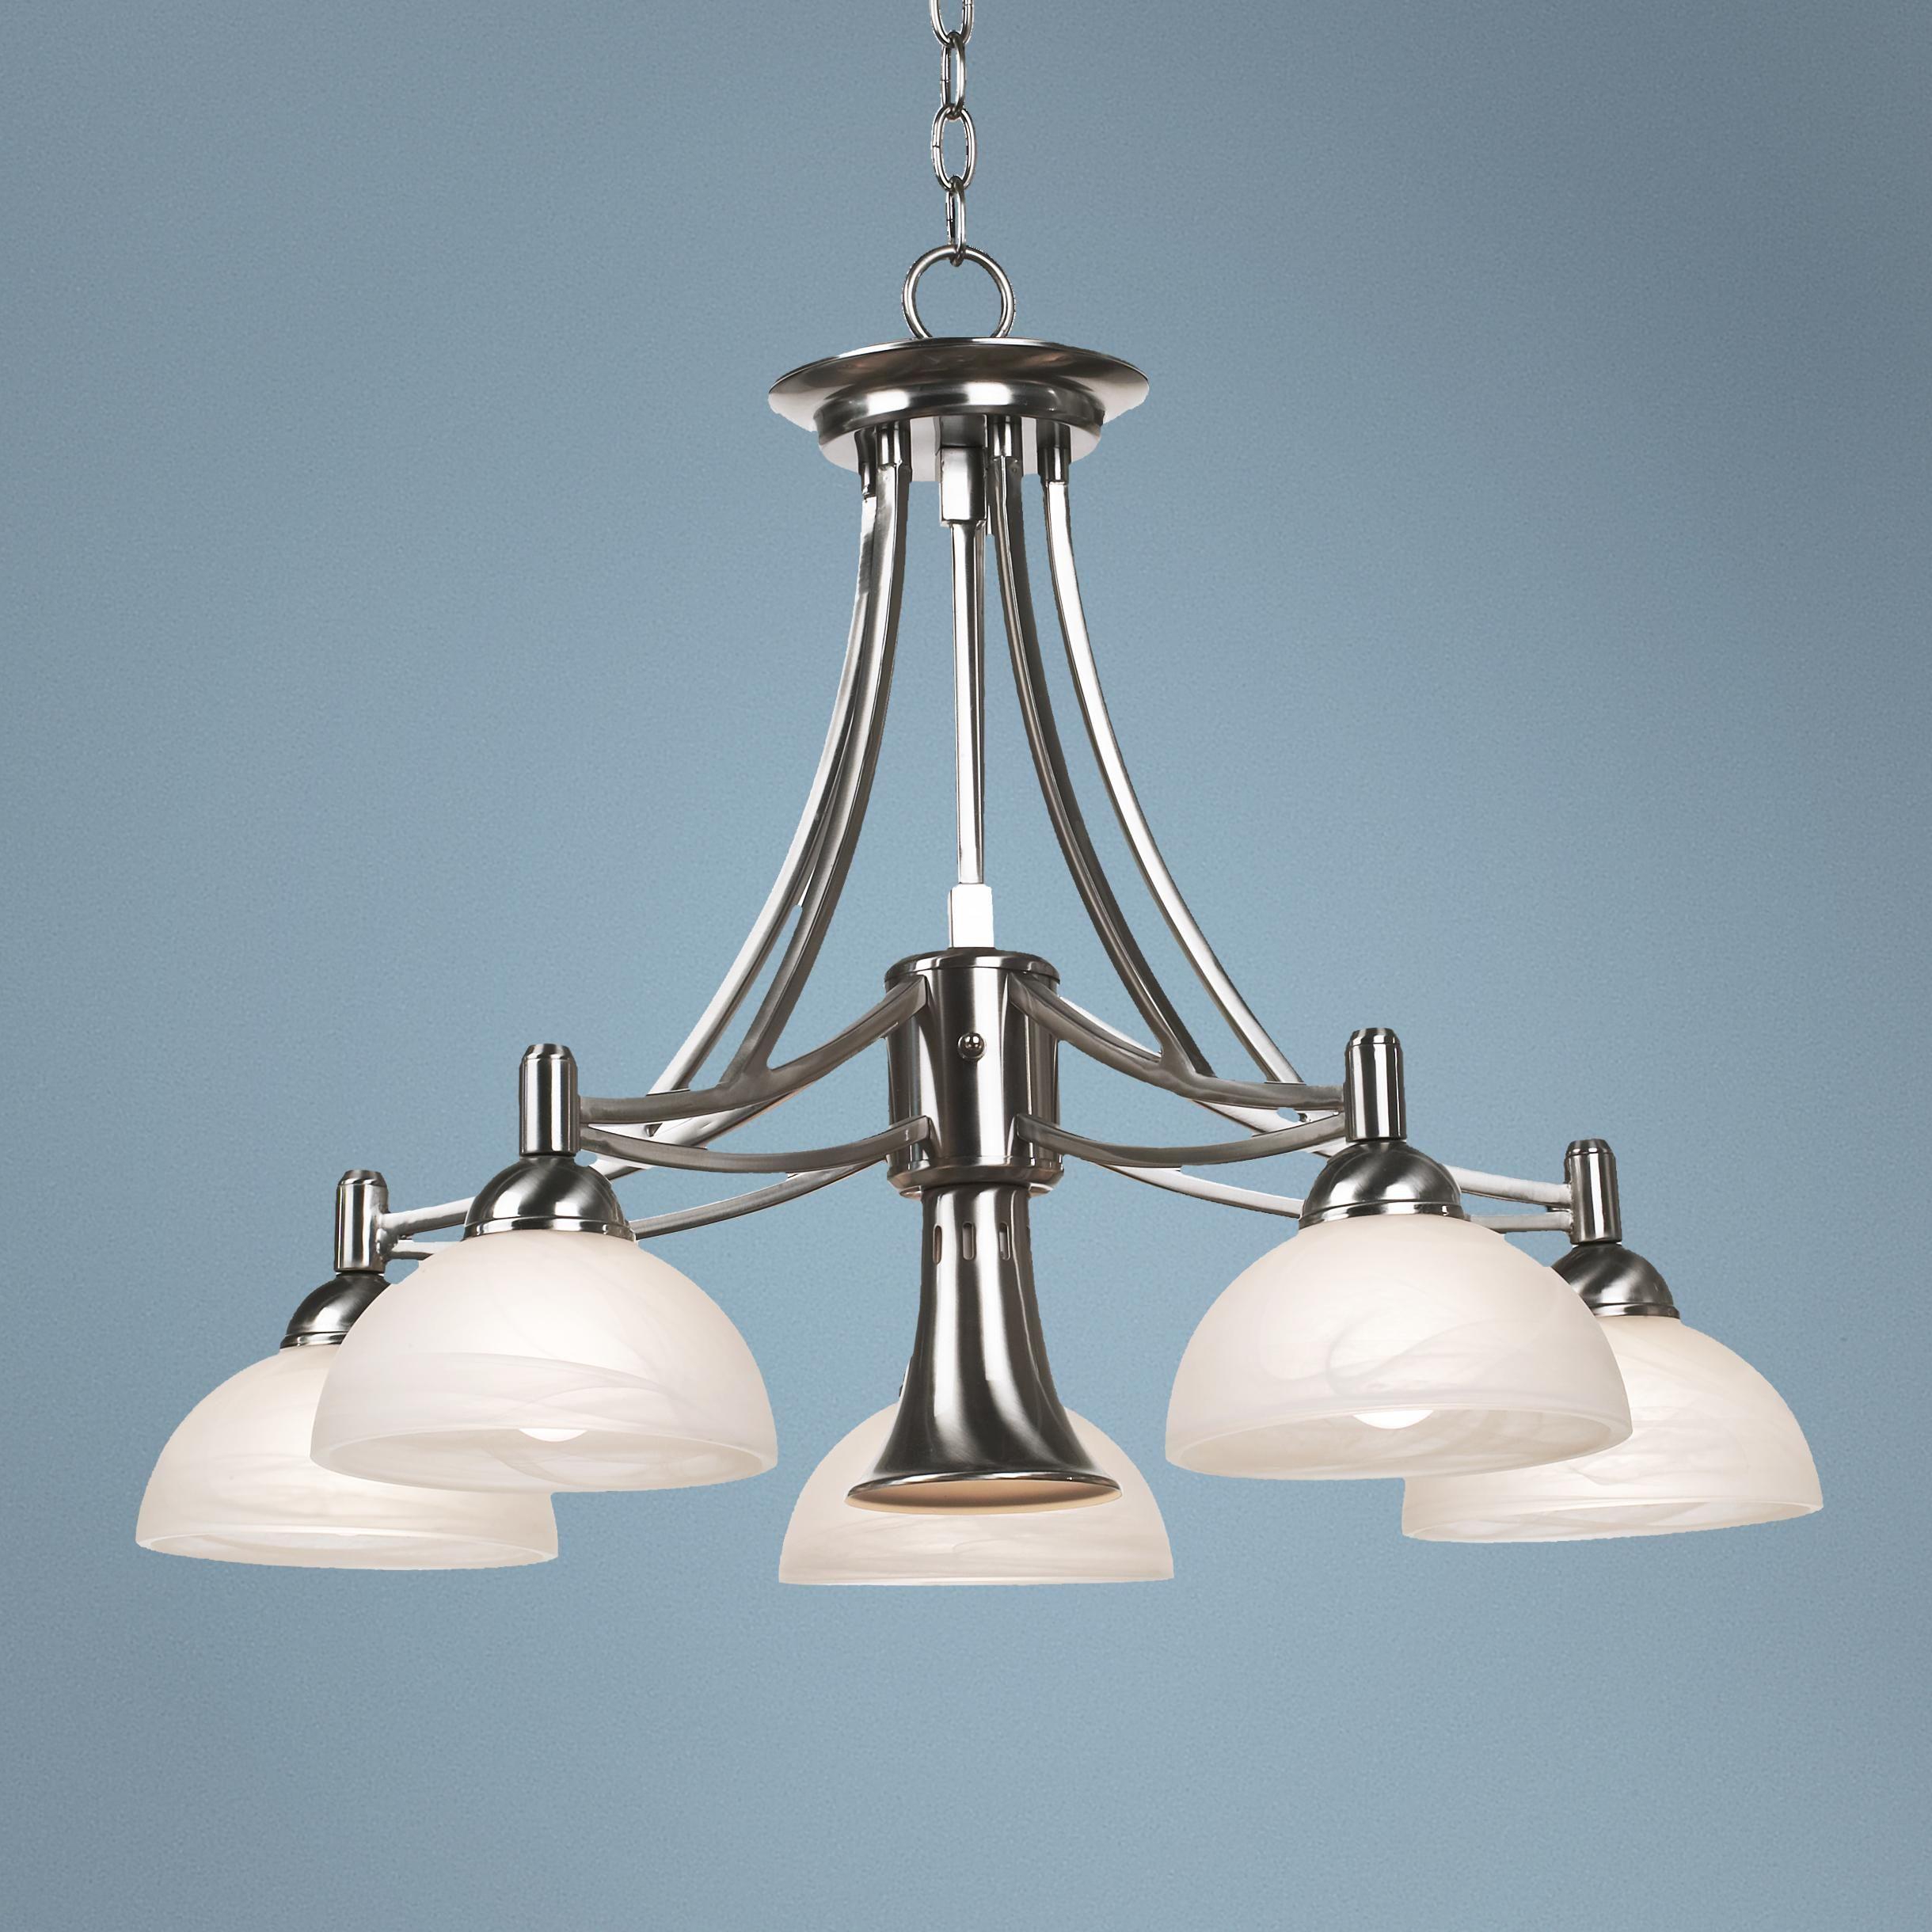 Contemporary Brushed Nickel Downlight Chandelier -   street light ...